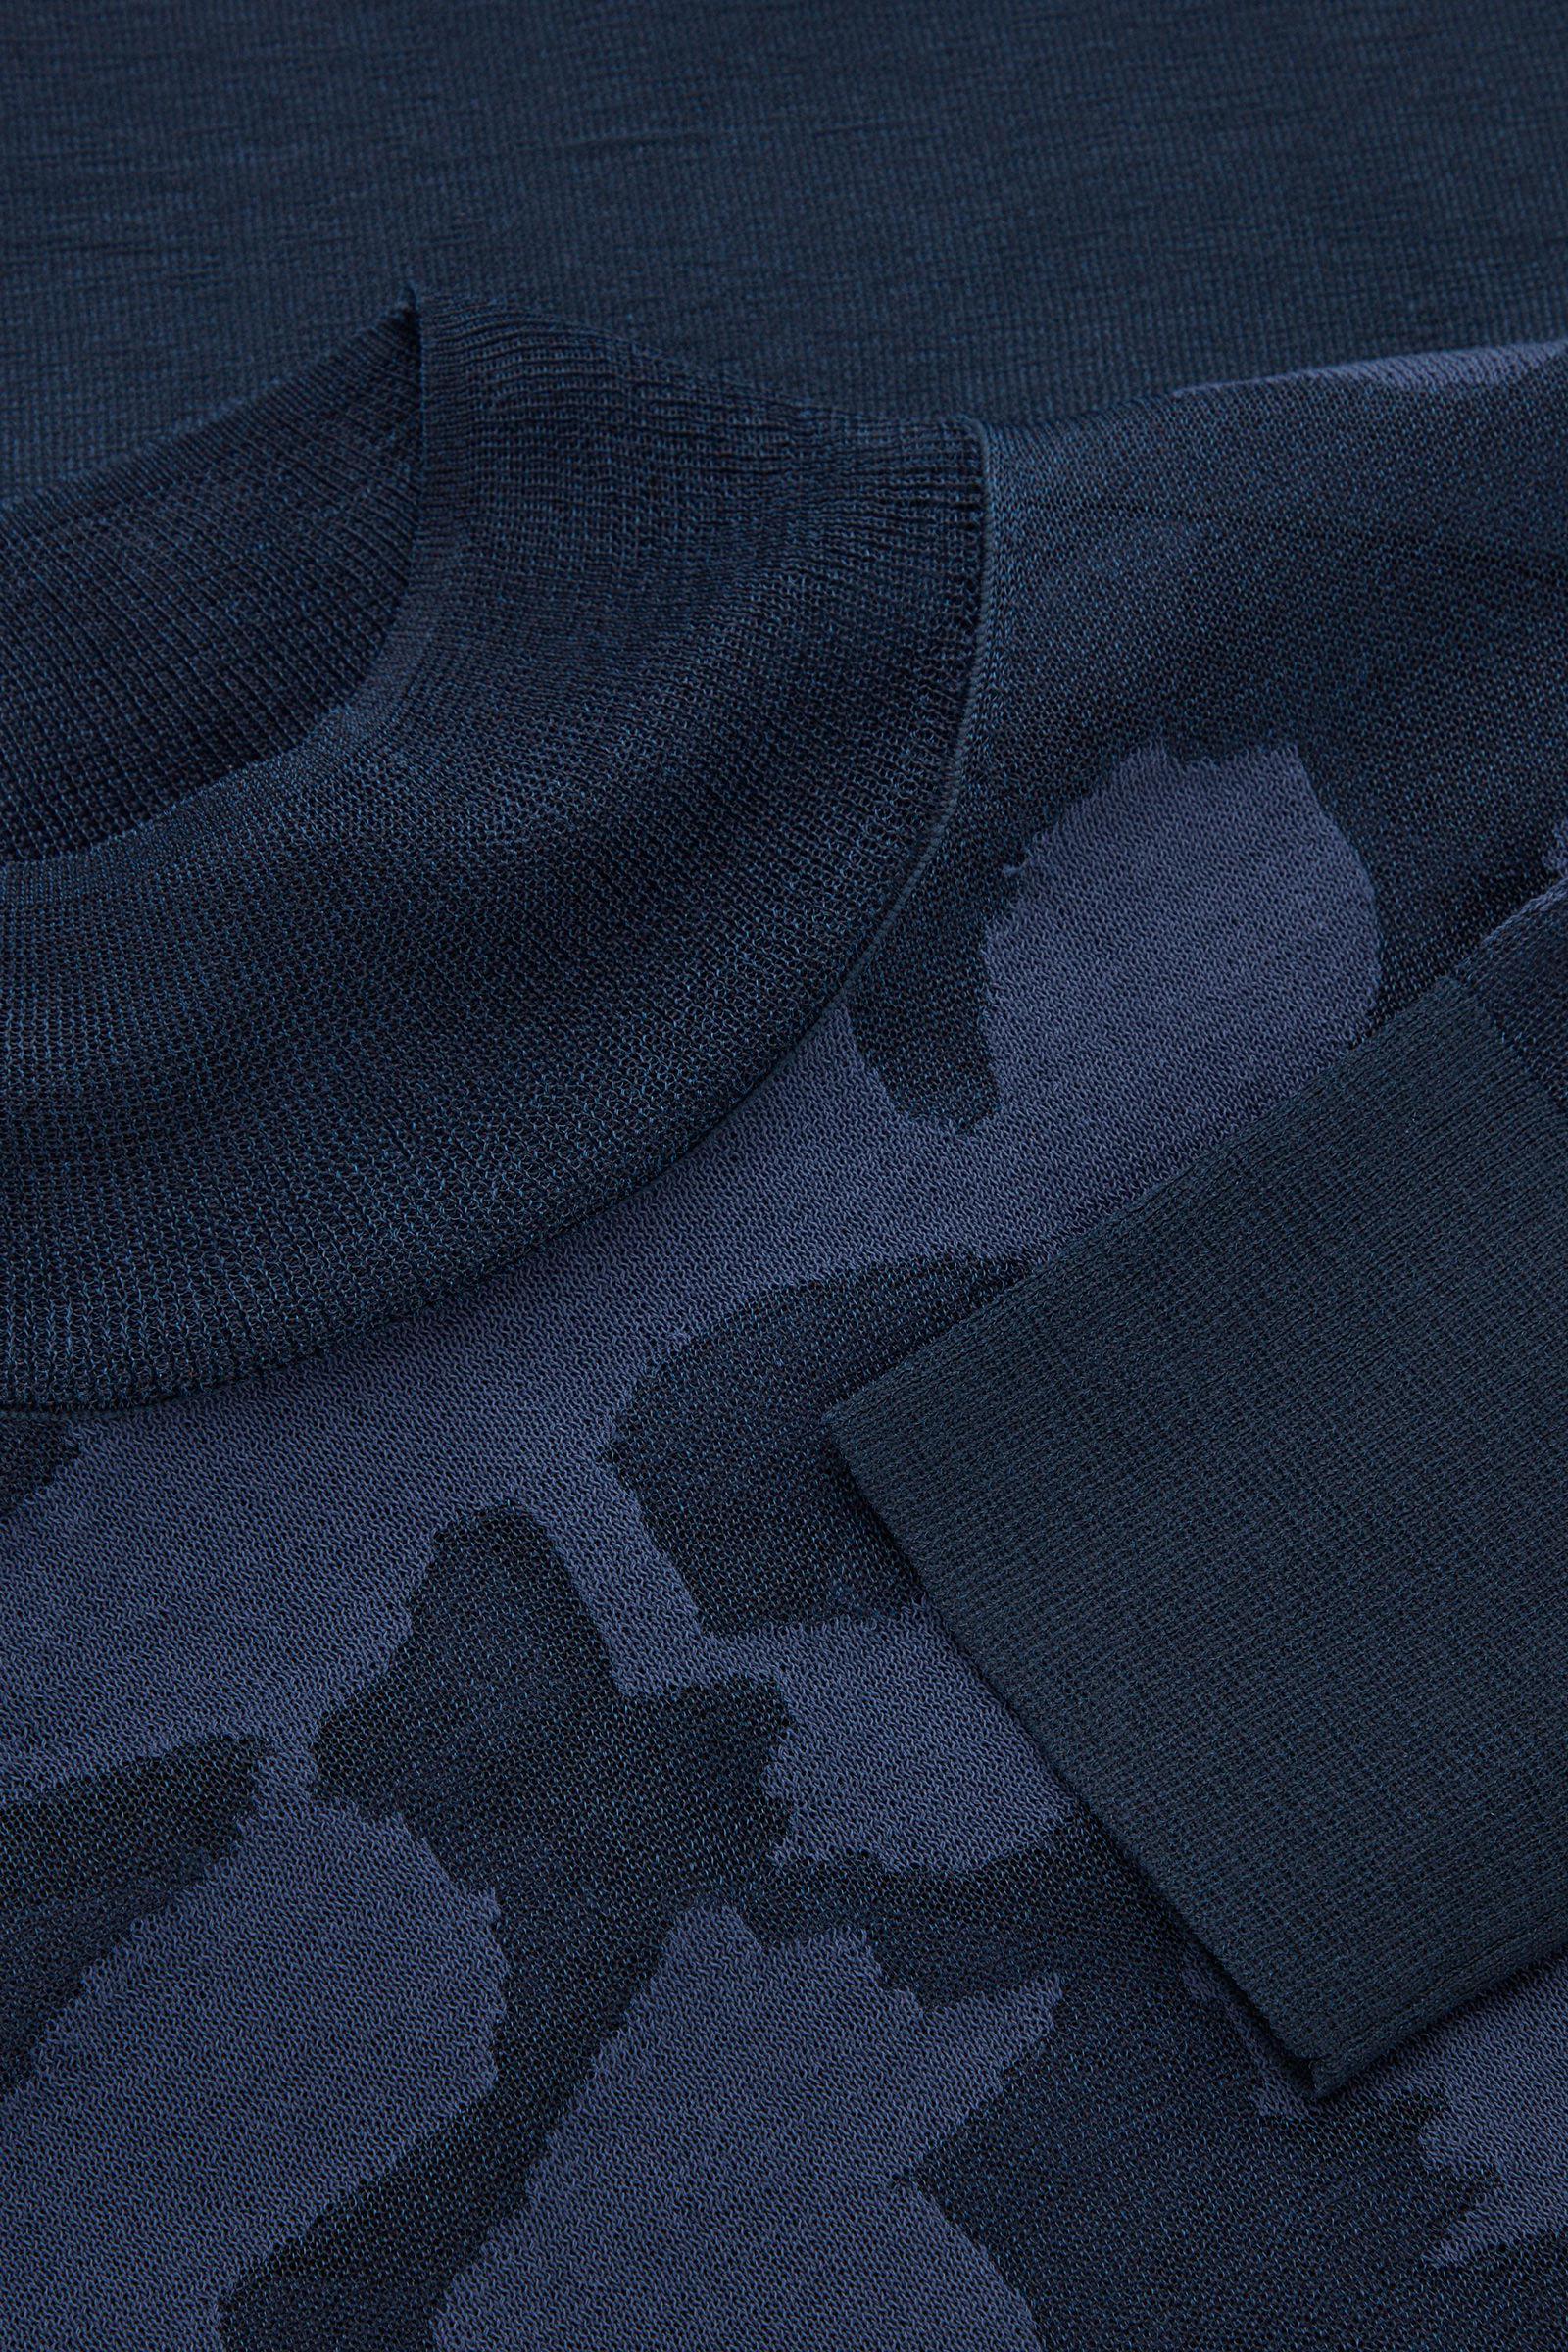 COS 앱스트랙트 아트 디테일 쉬어 롤넥 스웨터의 네이비컬러 Detail입니다.